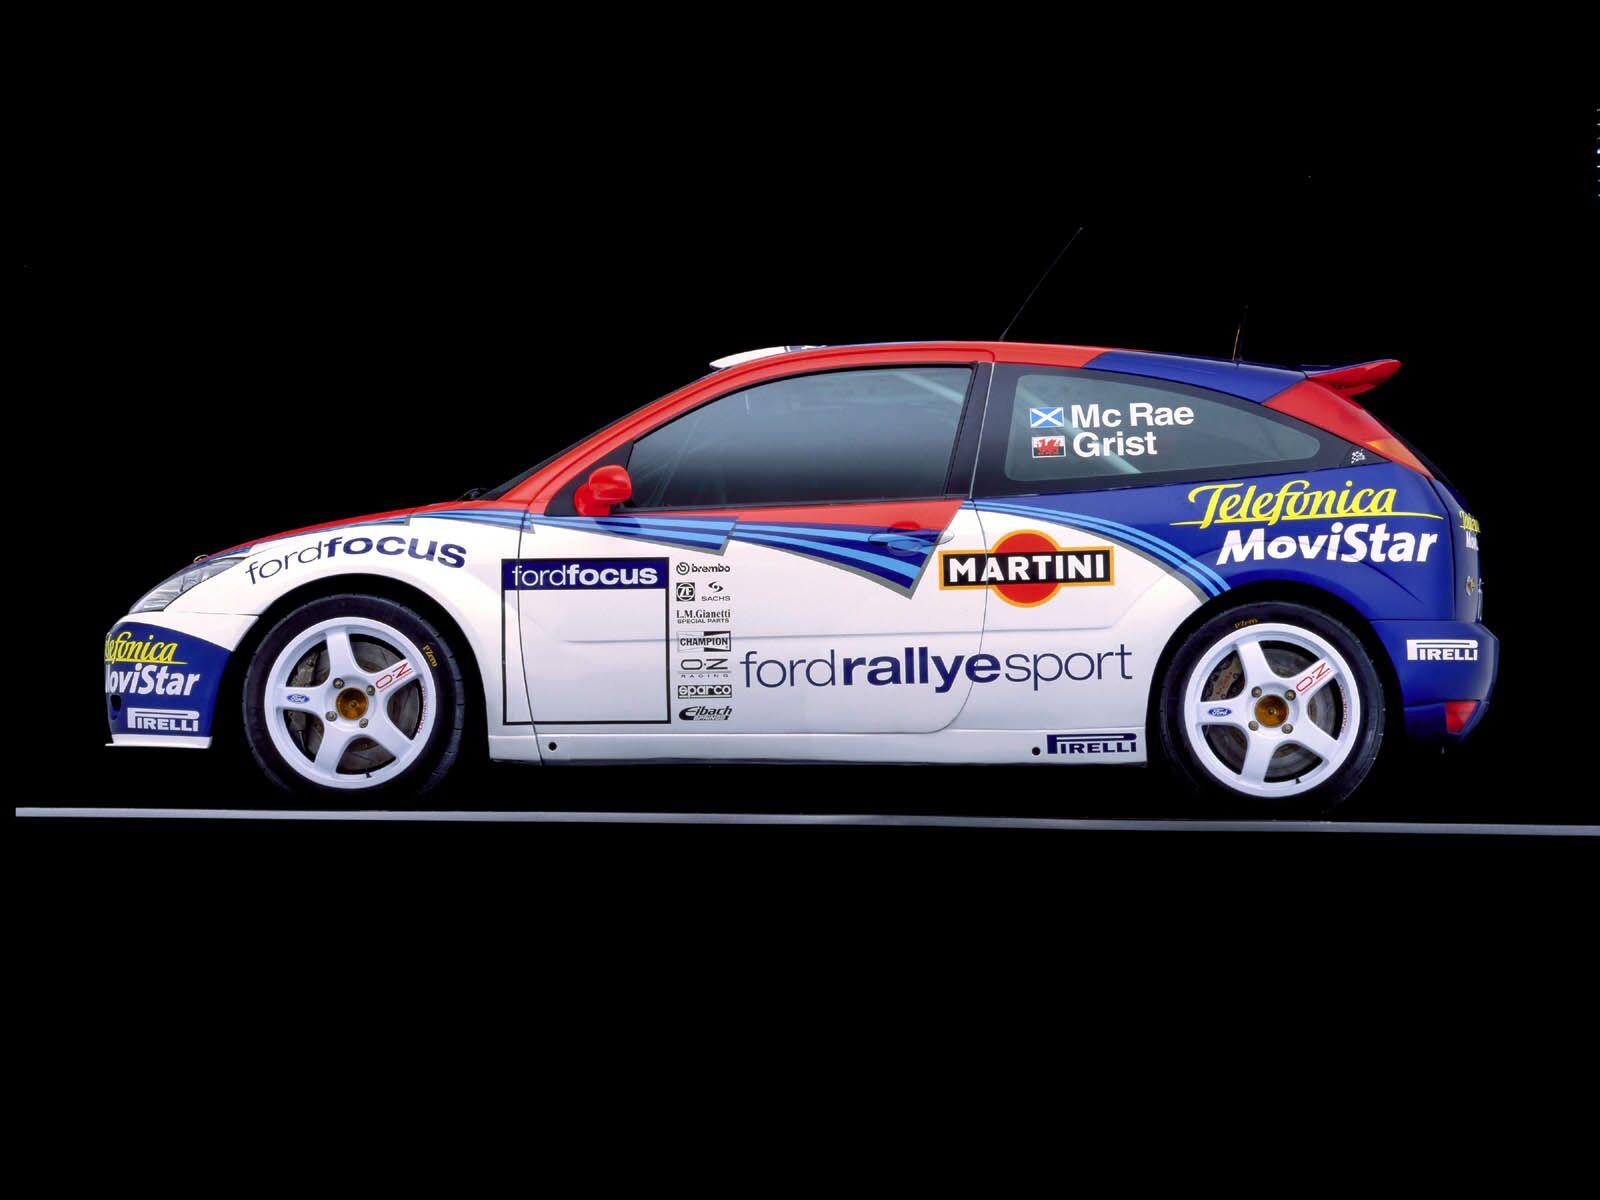 1999 ford focus wrc race racing h wallpaper 1600x1200. Black Bedroom Furniture Sets. Home Design Ideas